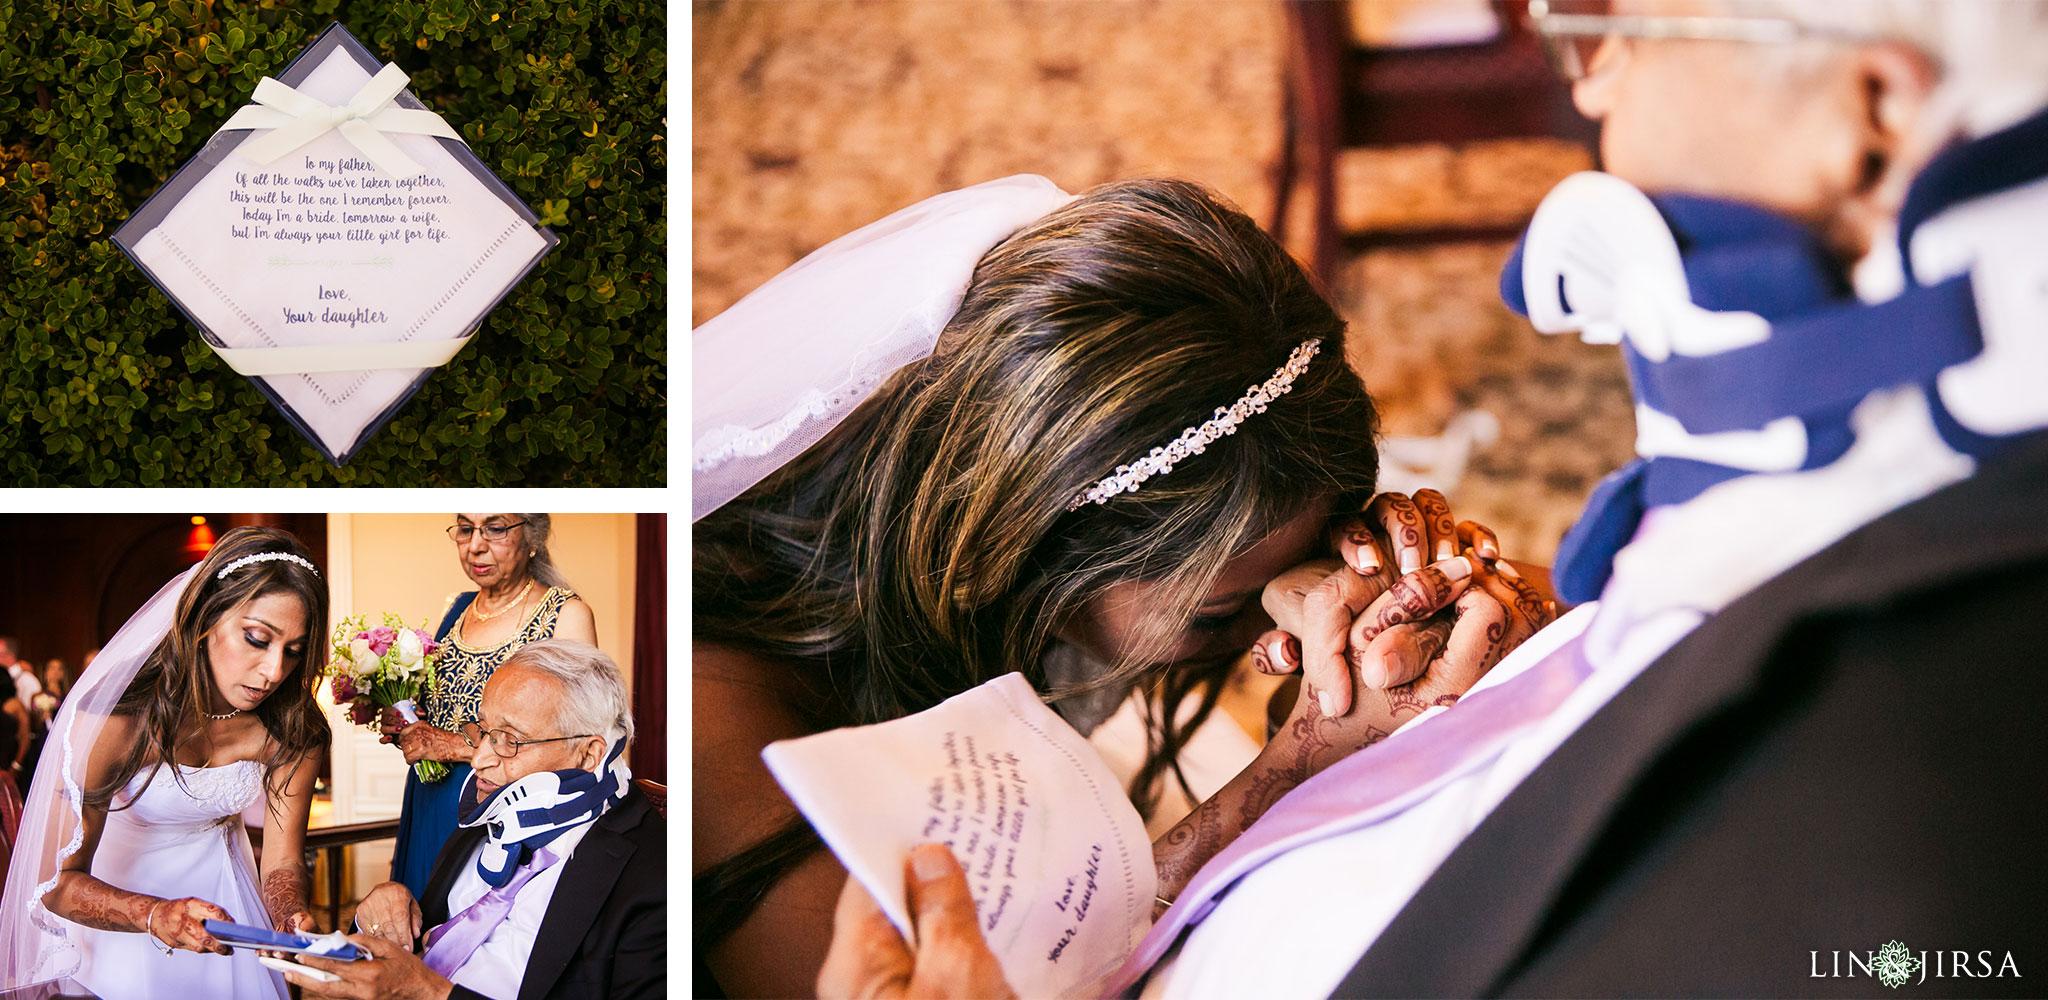 052 sherwood country club indian wedding photojournalism photography